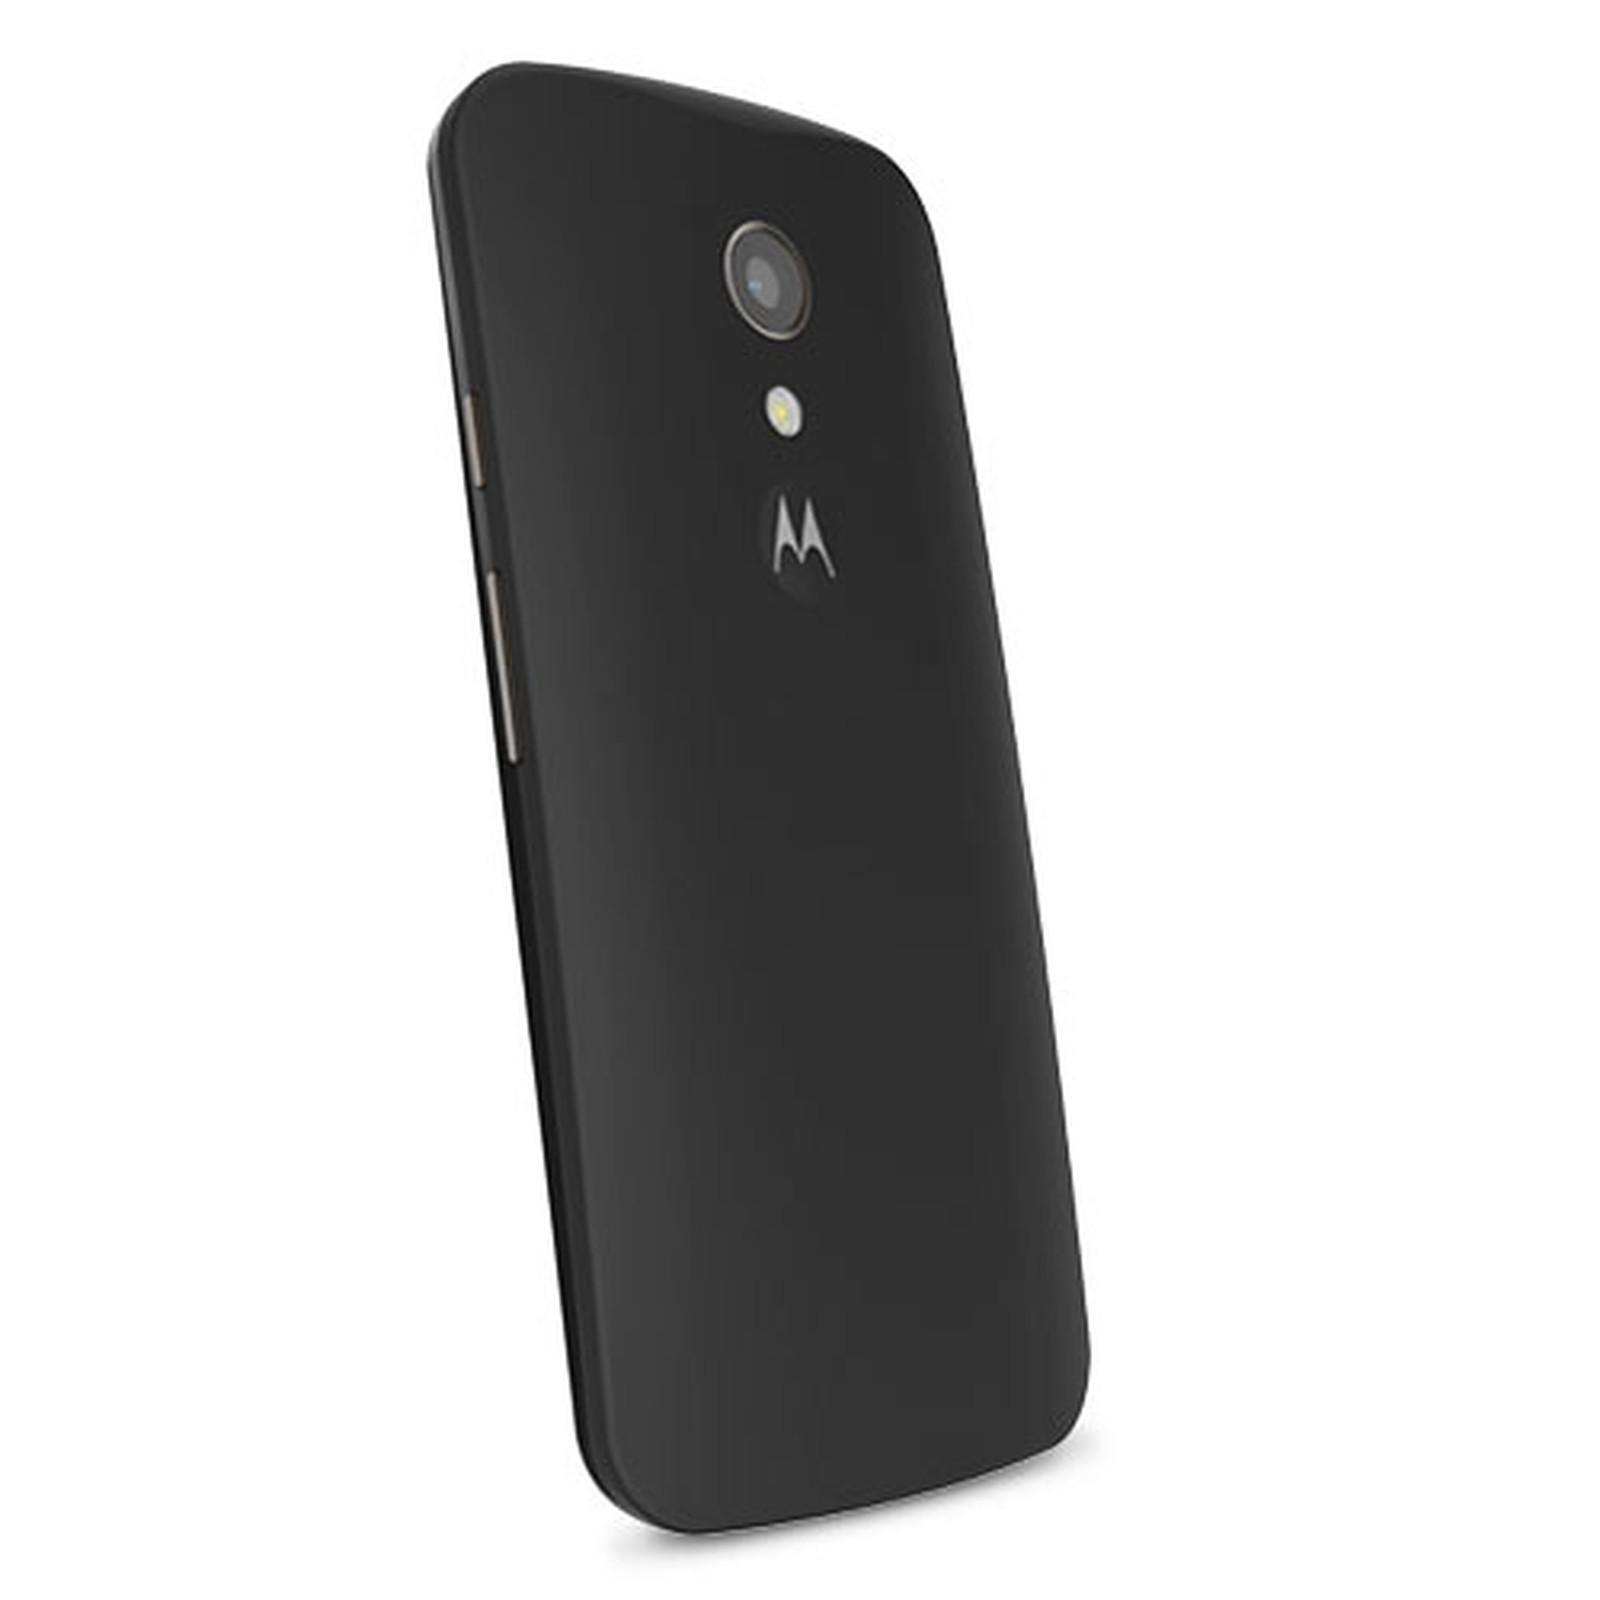 Motorola Coque d'origine Noir Motorola Moto G 2ème Génération